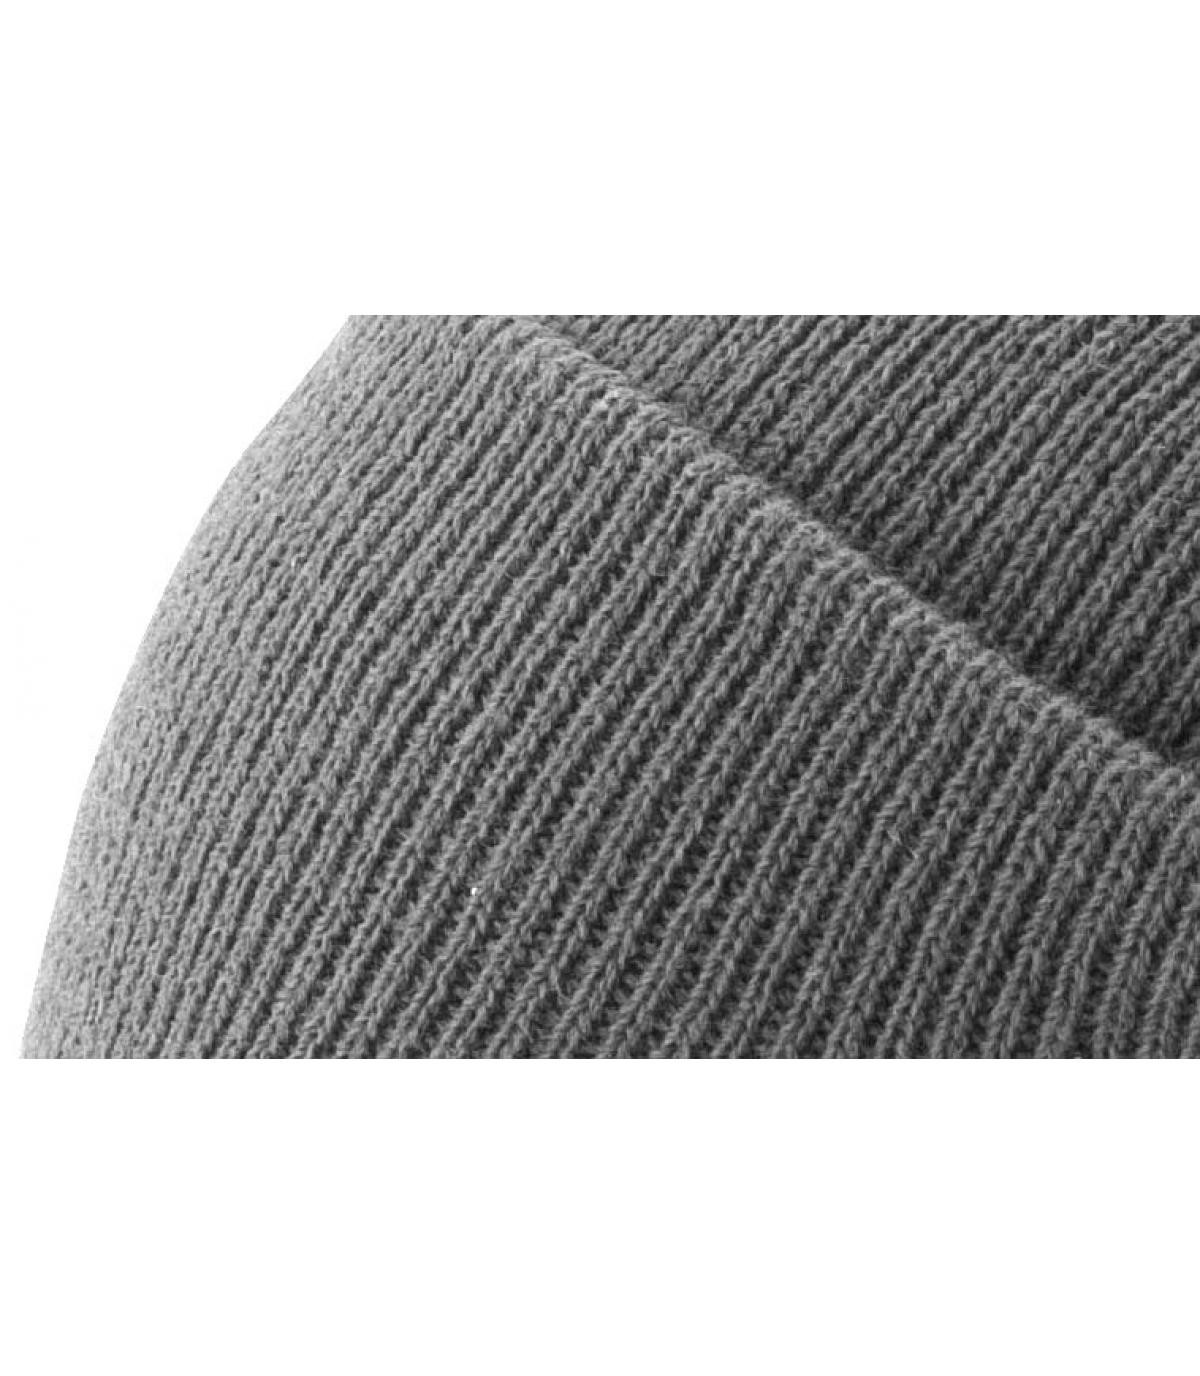 Details The uniform zwart - afbeeling 2